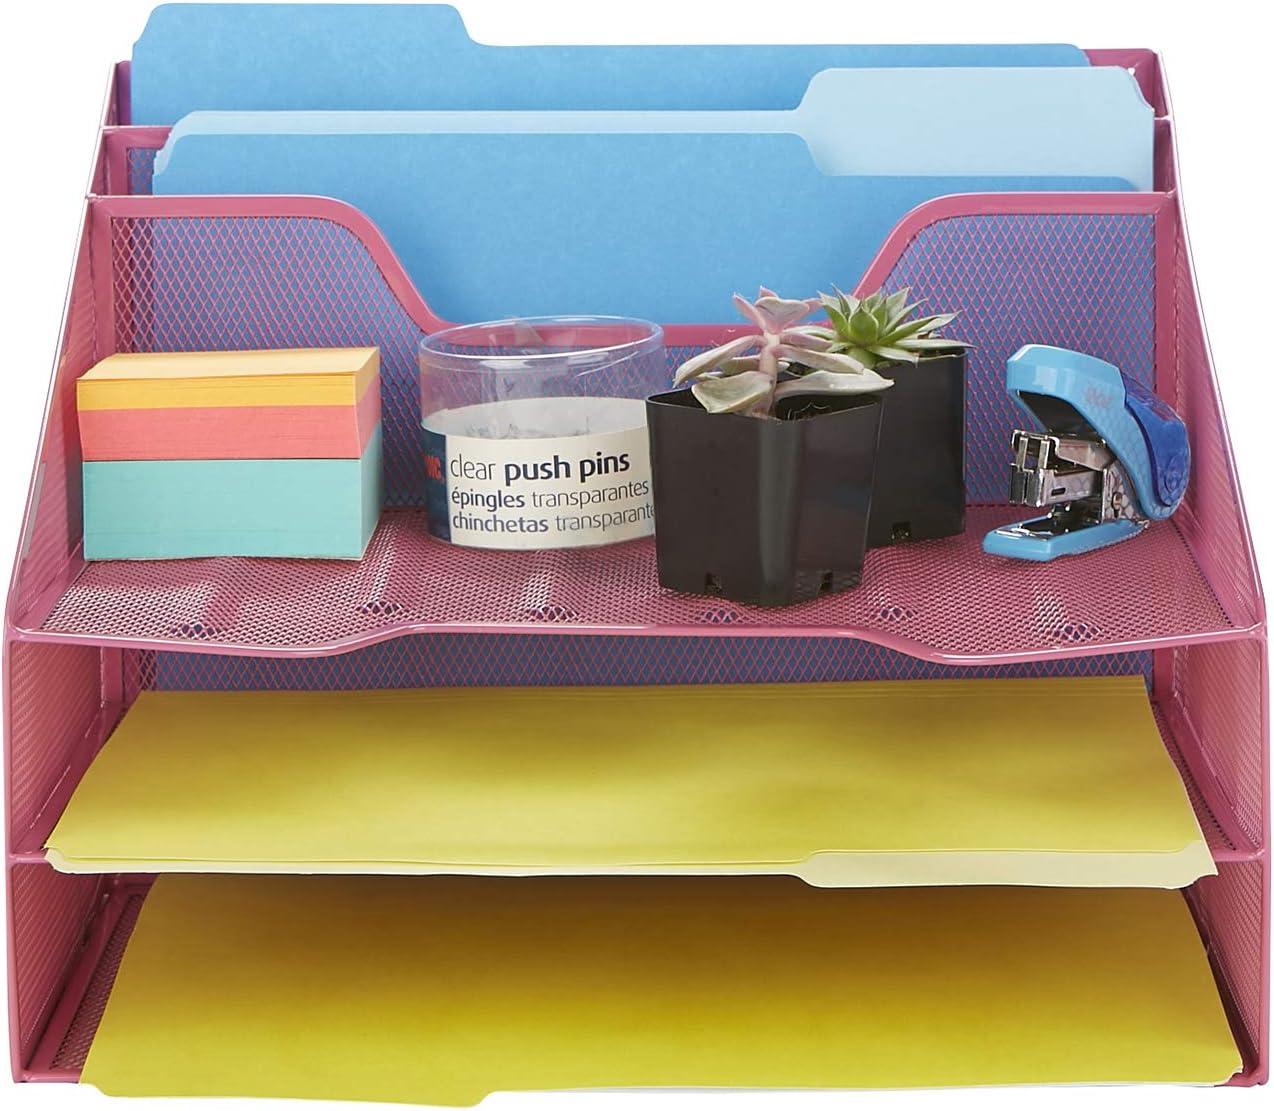 Mind Reader MESHBOX5-PNK Mesh Organizer 5 Desktop Document Letter Tray for Folders, Mail, Stationary, Desk Accessories, Pink